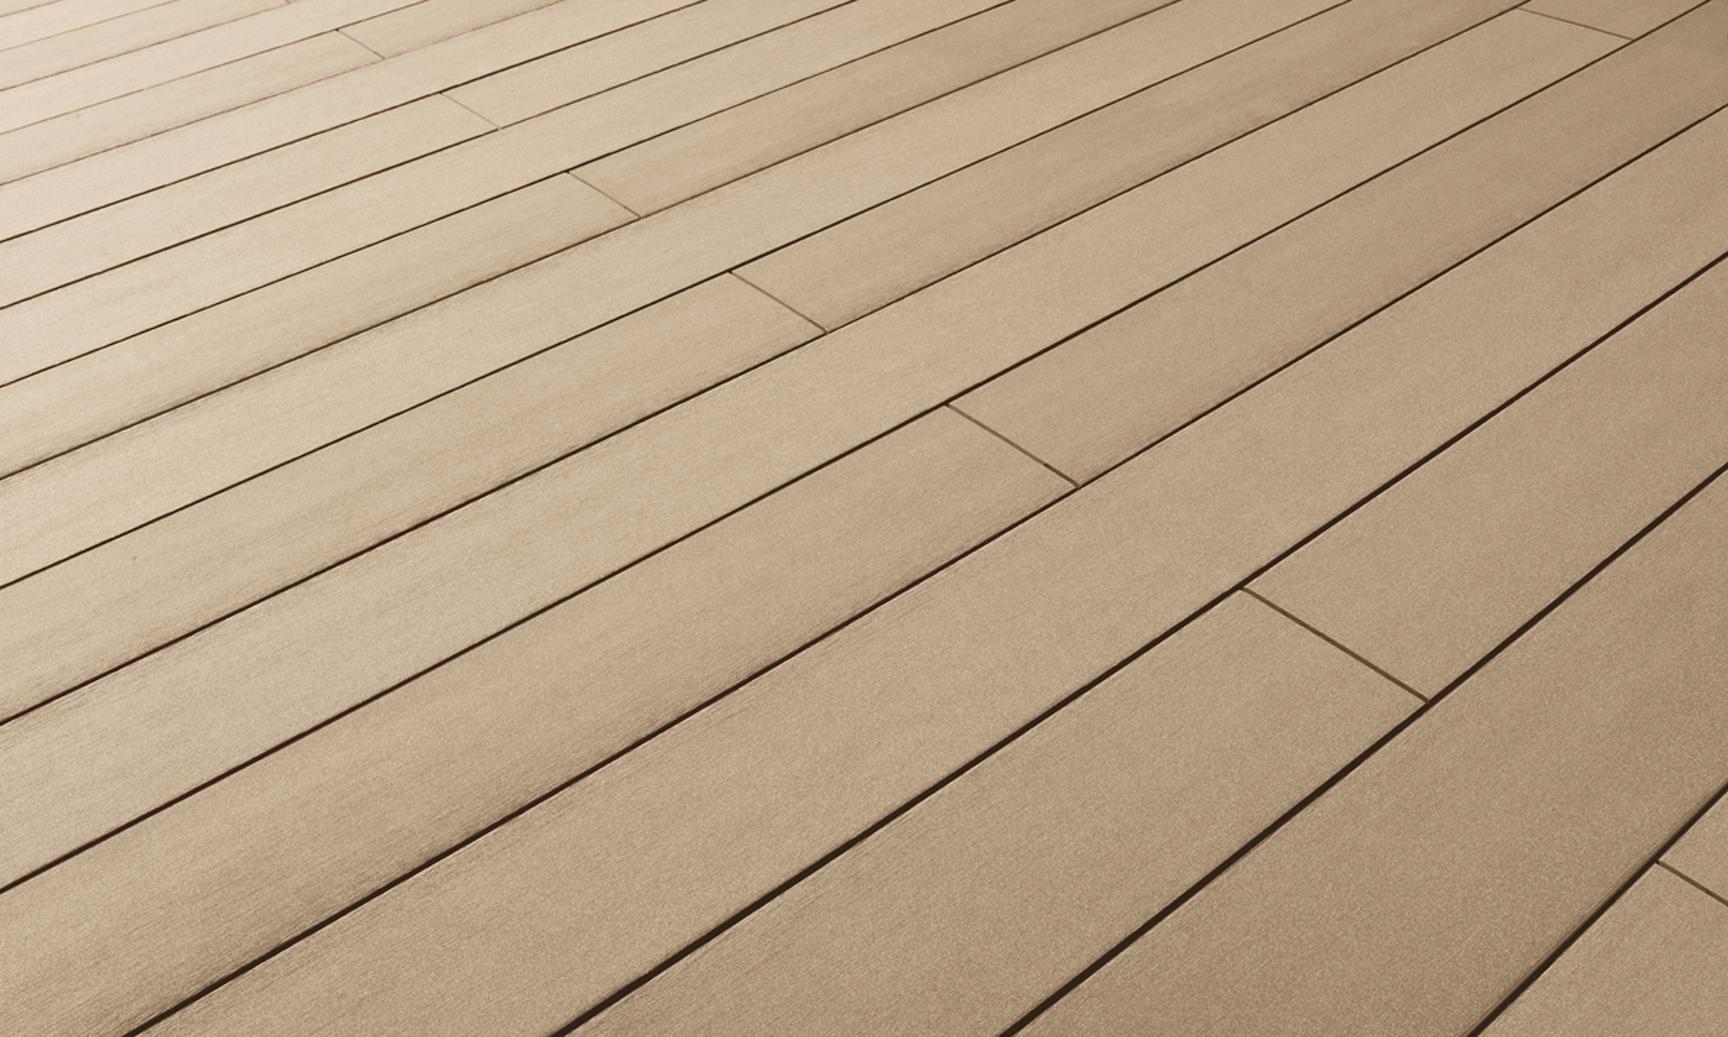 terrafina-composite-decking-plain-sand-surface-finish